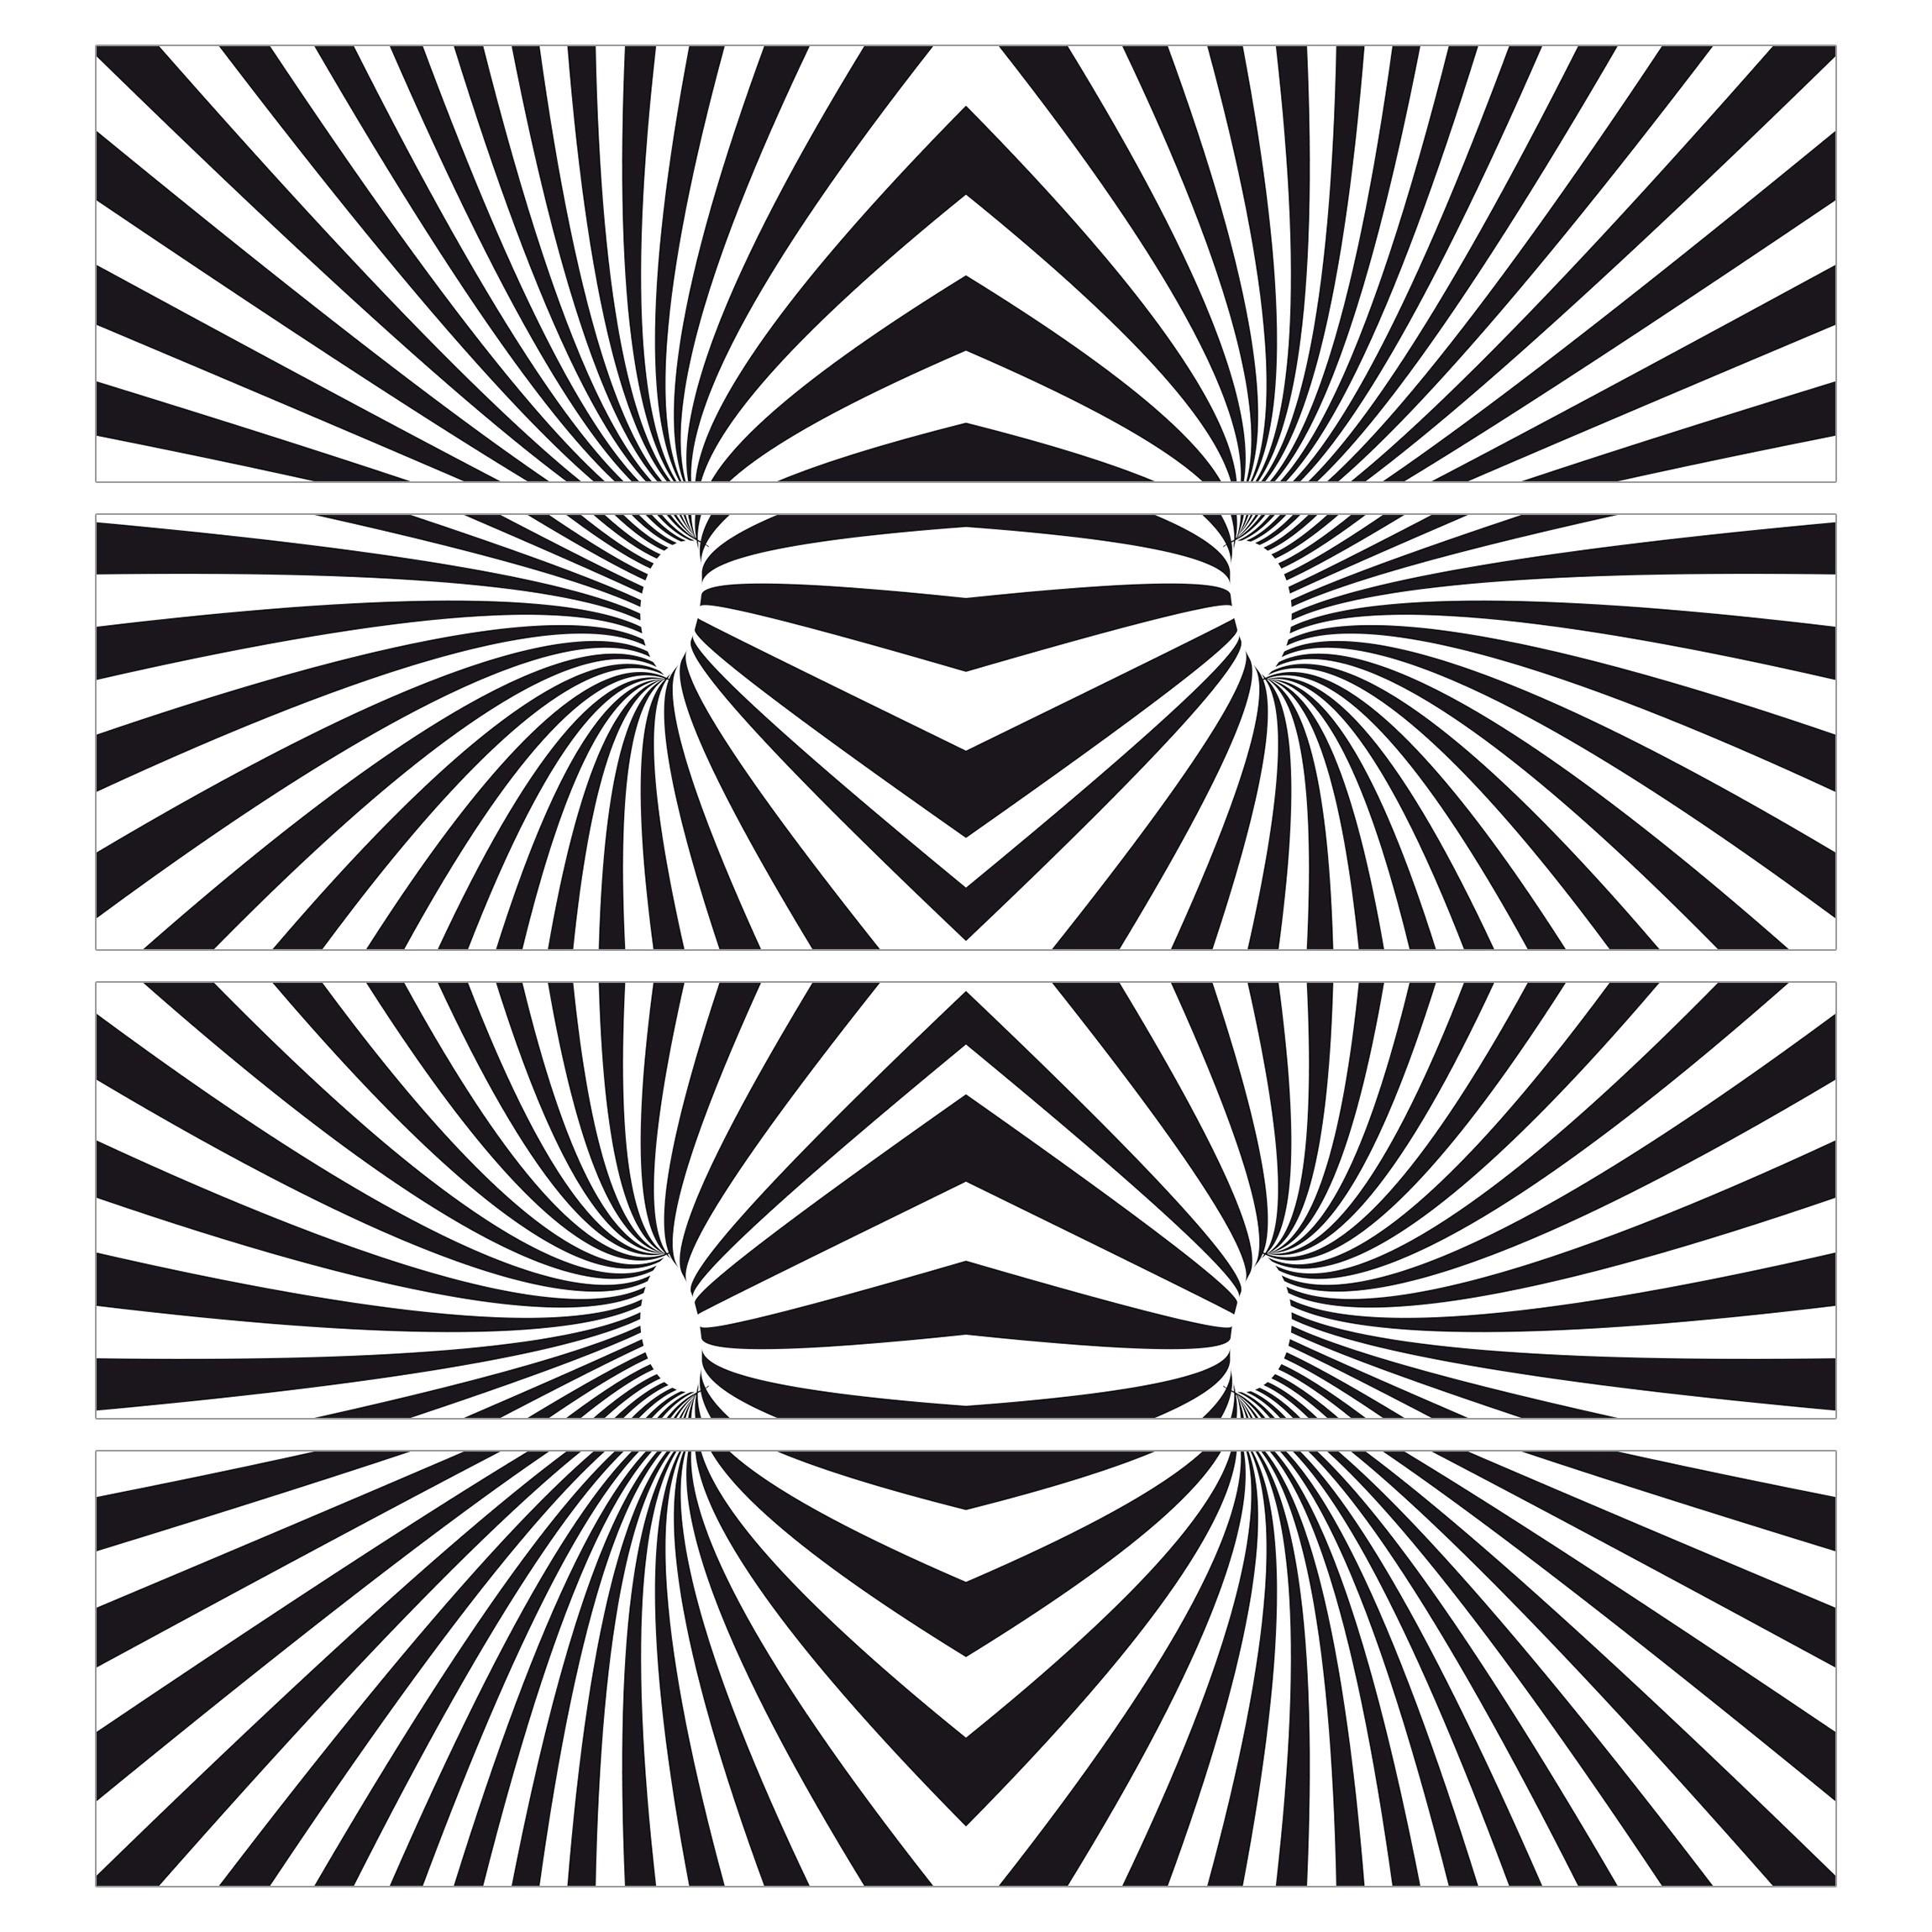 m belfolie f r ikea malm kommode selbstklebende folie psychedelisches schwarzwei muster. Black Bedroom Furniture Sets. Home Design Ideas